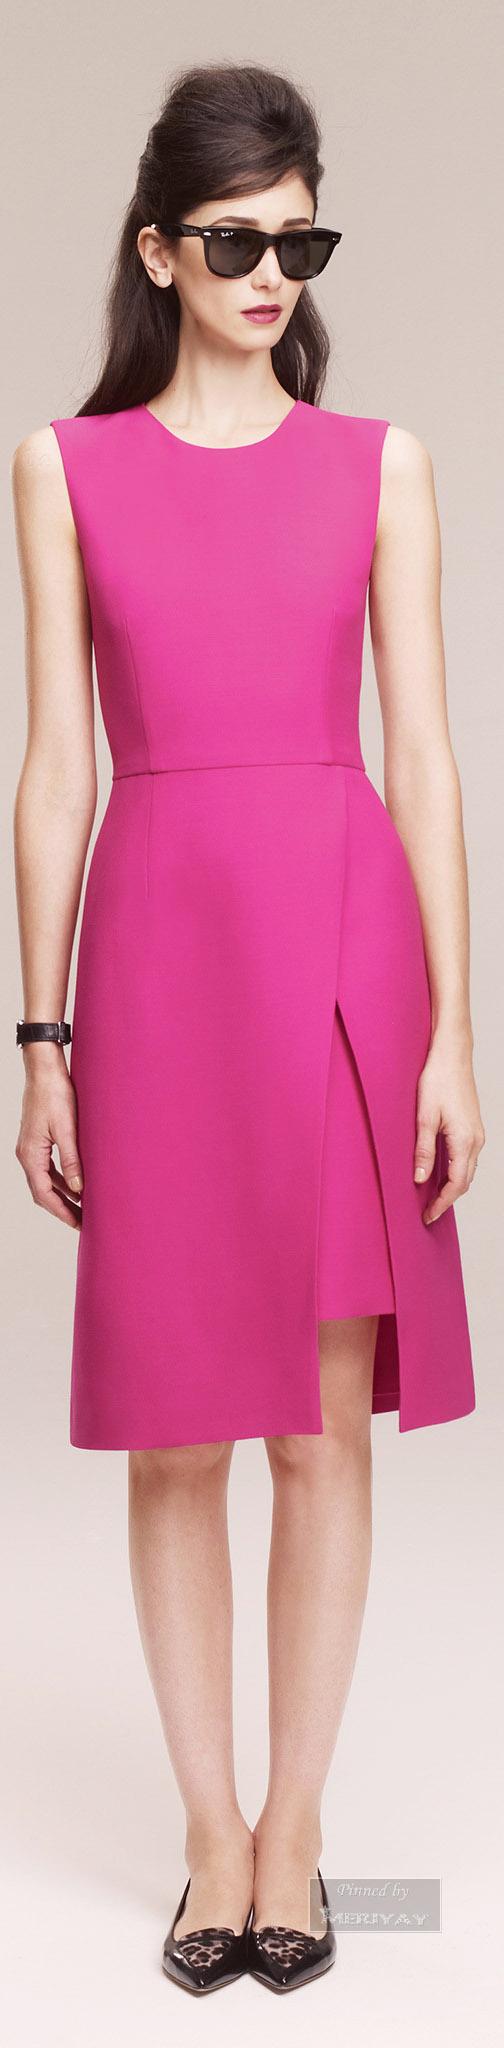 Lyn Devon.Fall Winter 2014-2015. | Pink Fashion | Pinterest ...